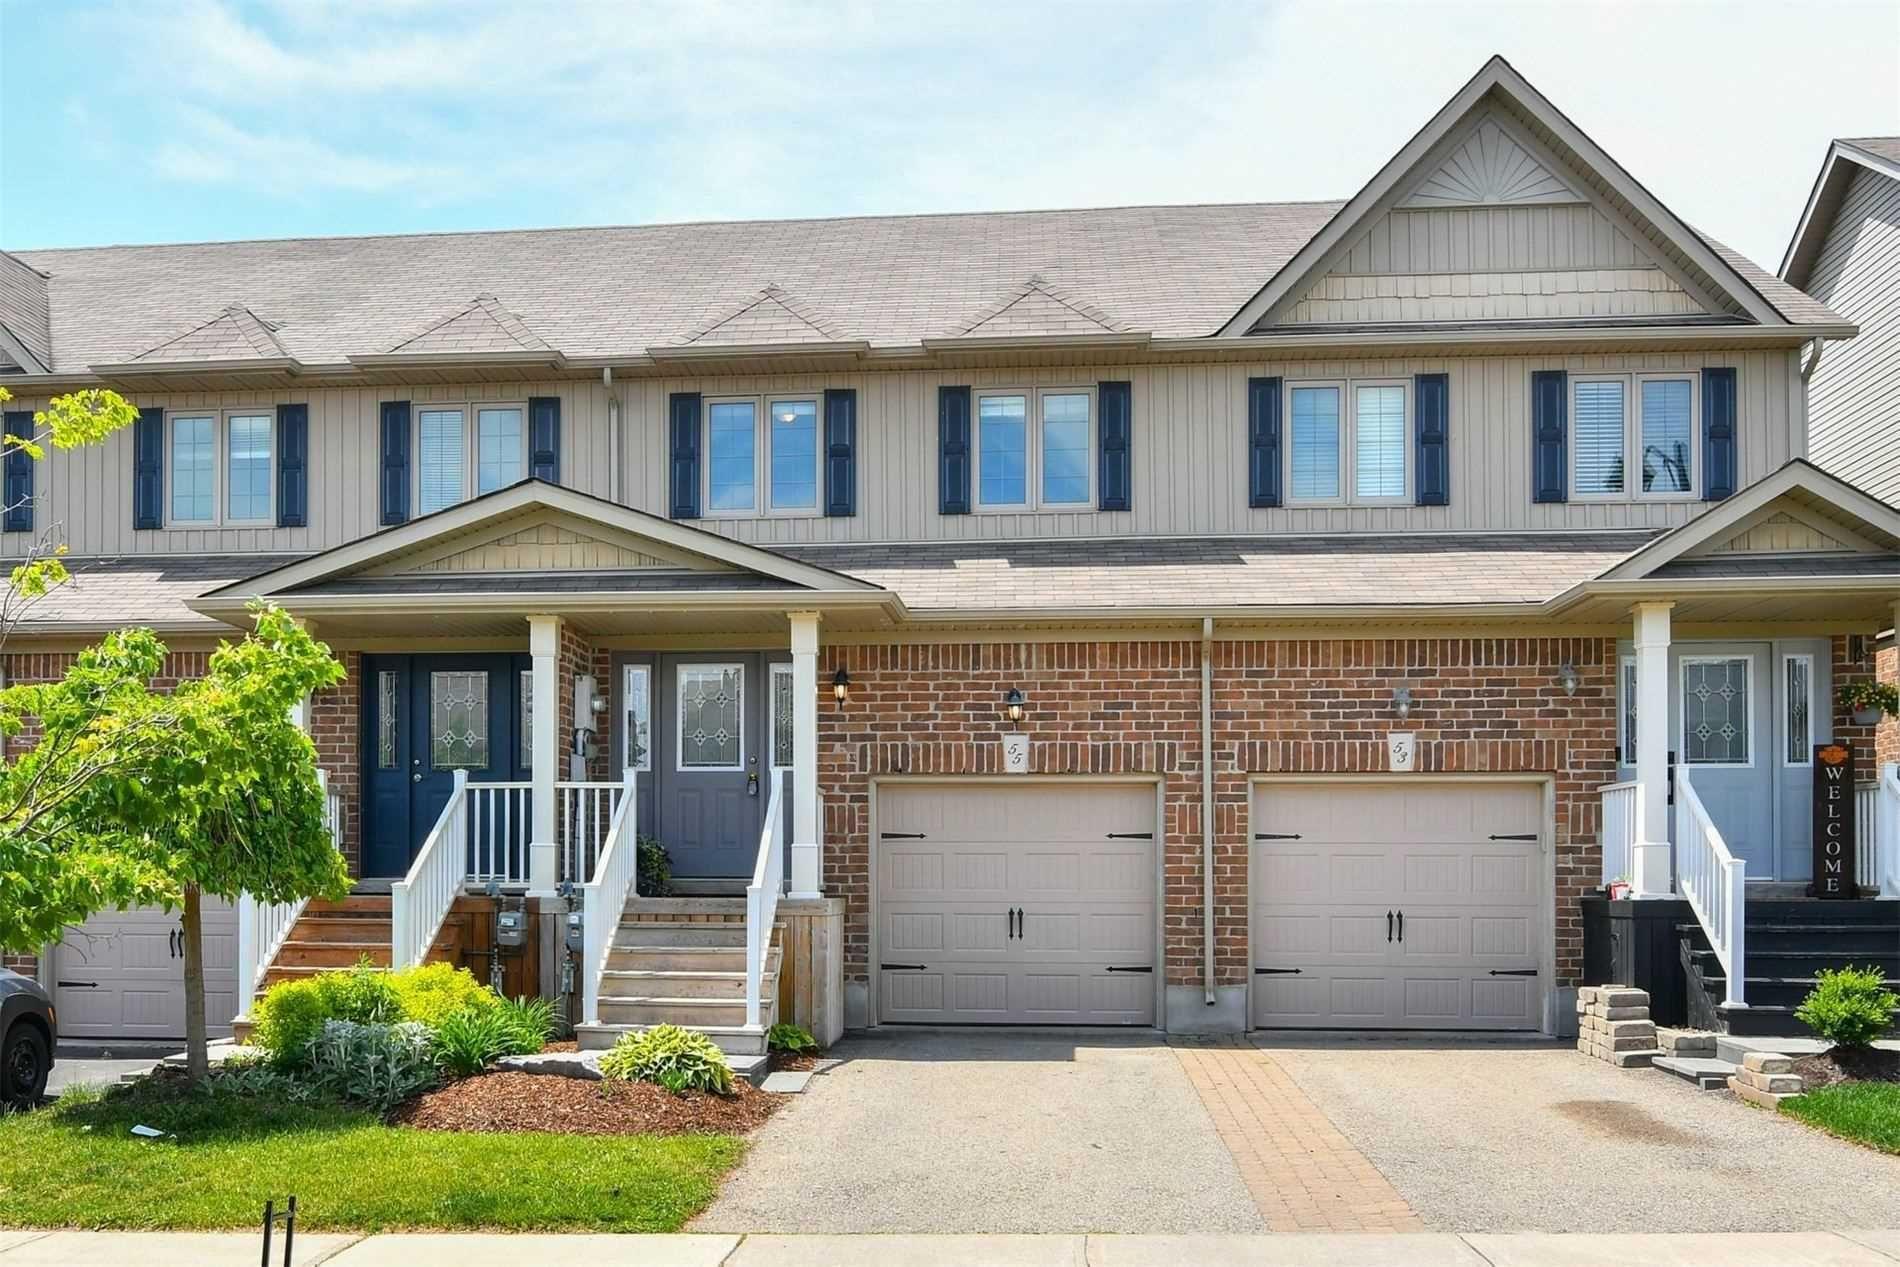 Main Photo: 55 James Arnott Crescent: Orangeville House (2-Storey) for sale : MLS®# W5266923